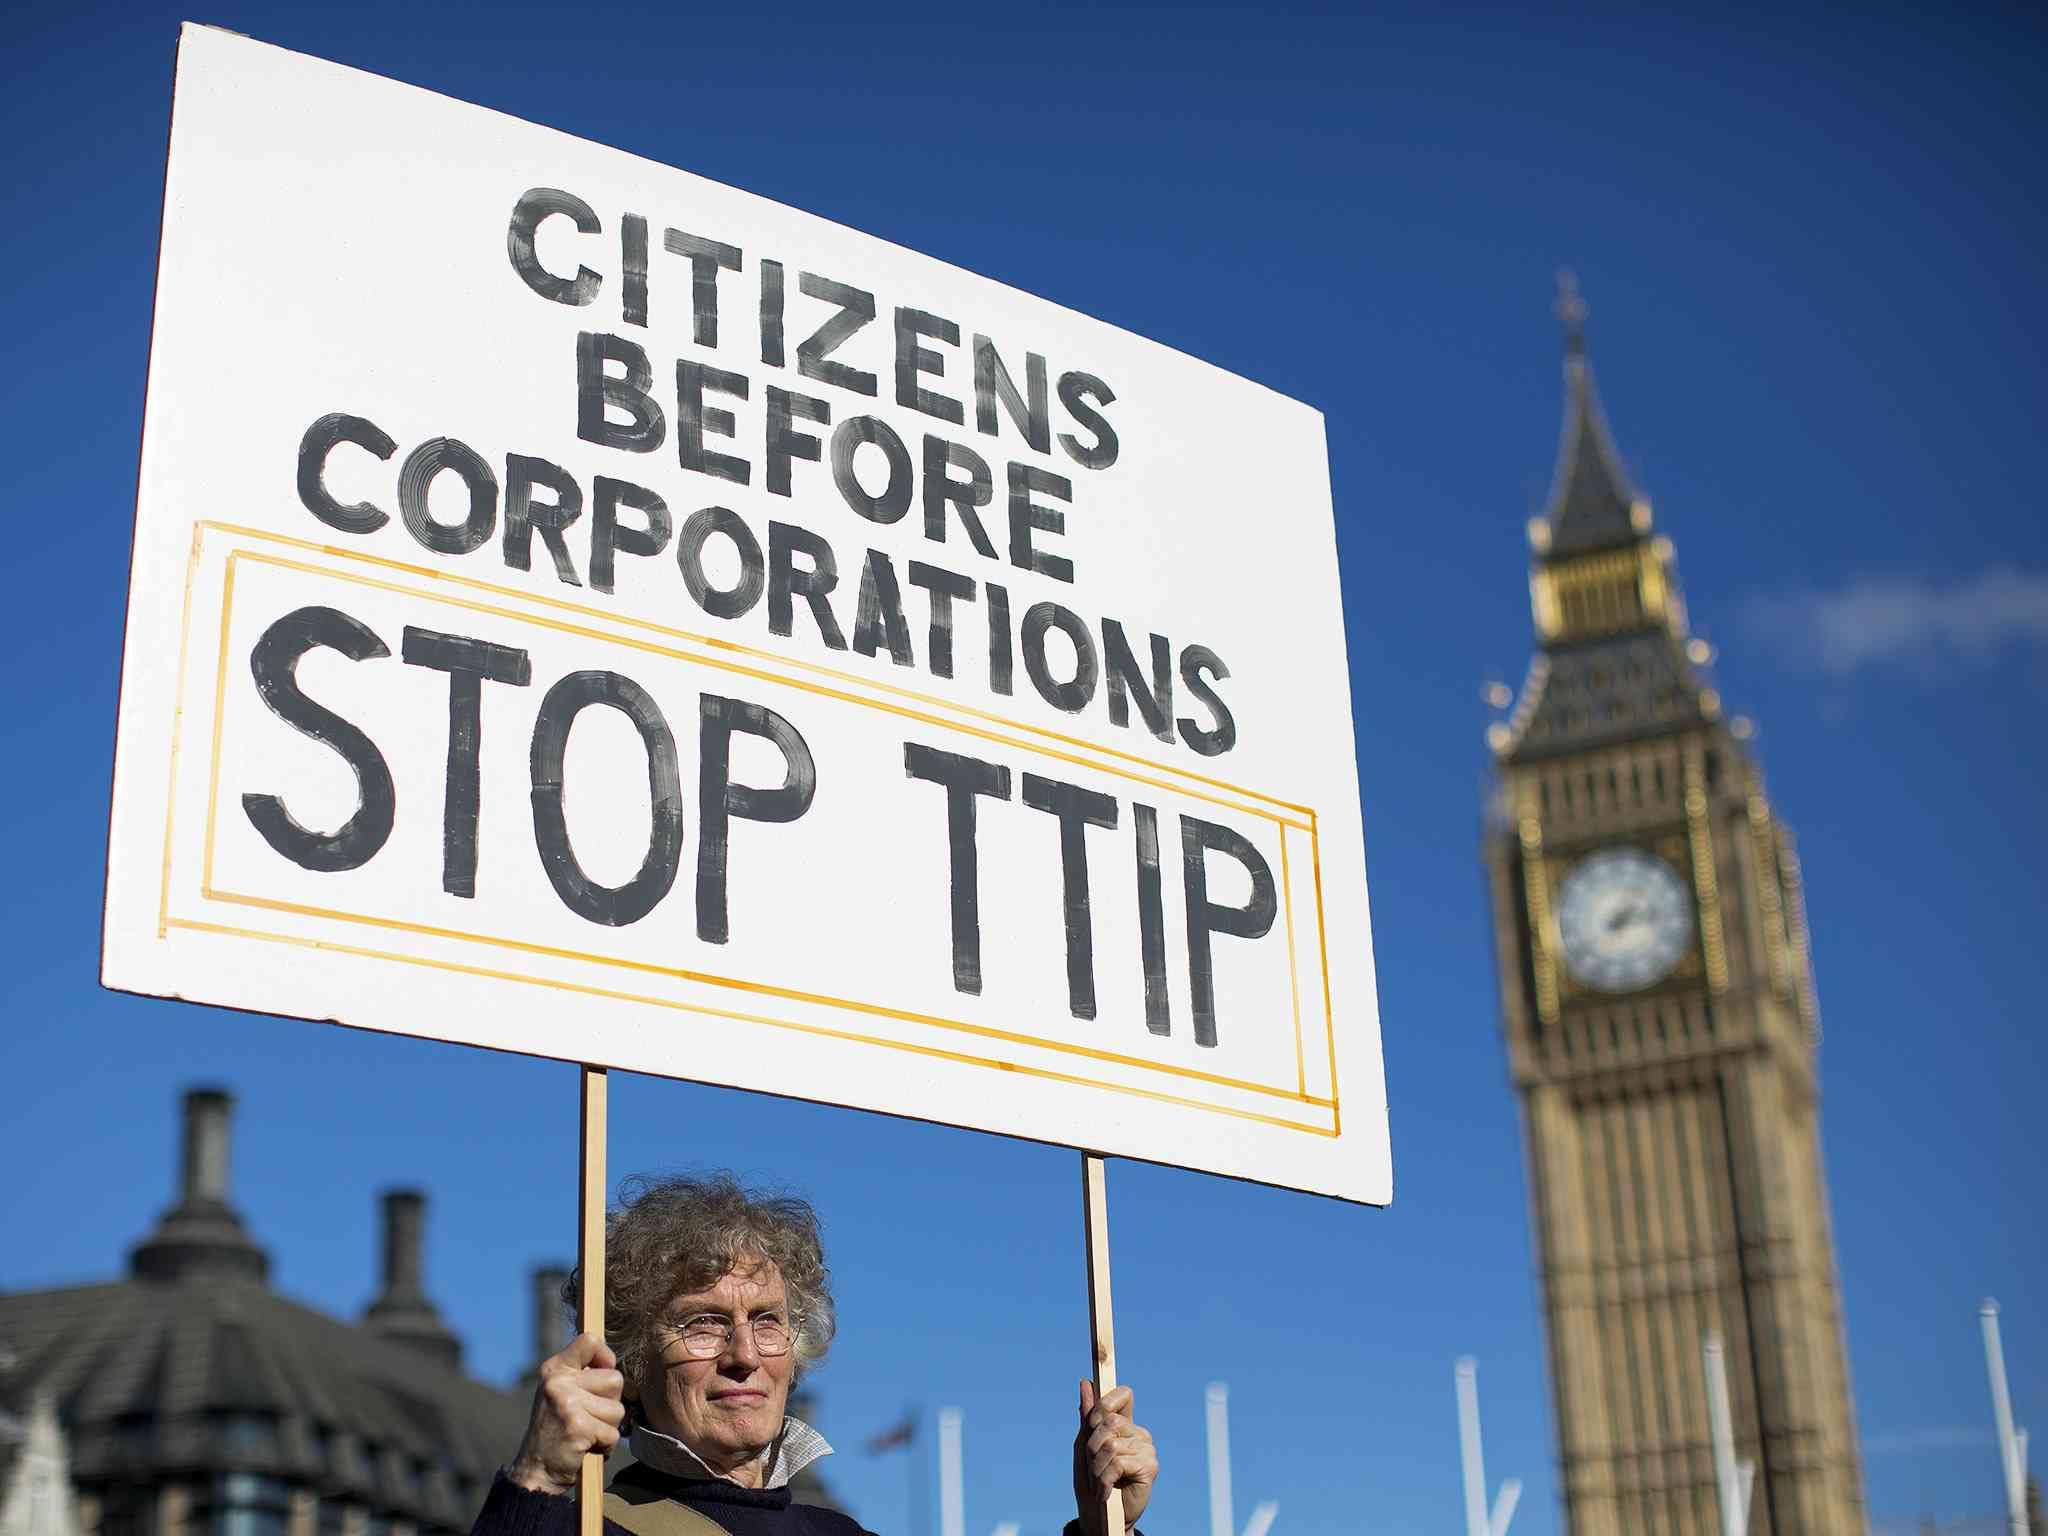 France threatens halt to TTIP talks barring progress in coming months